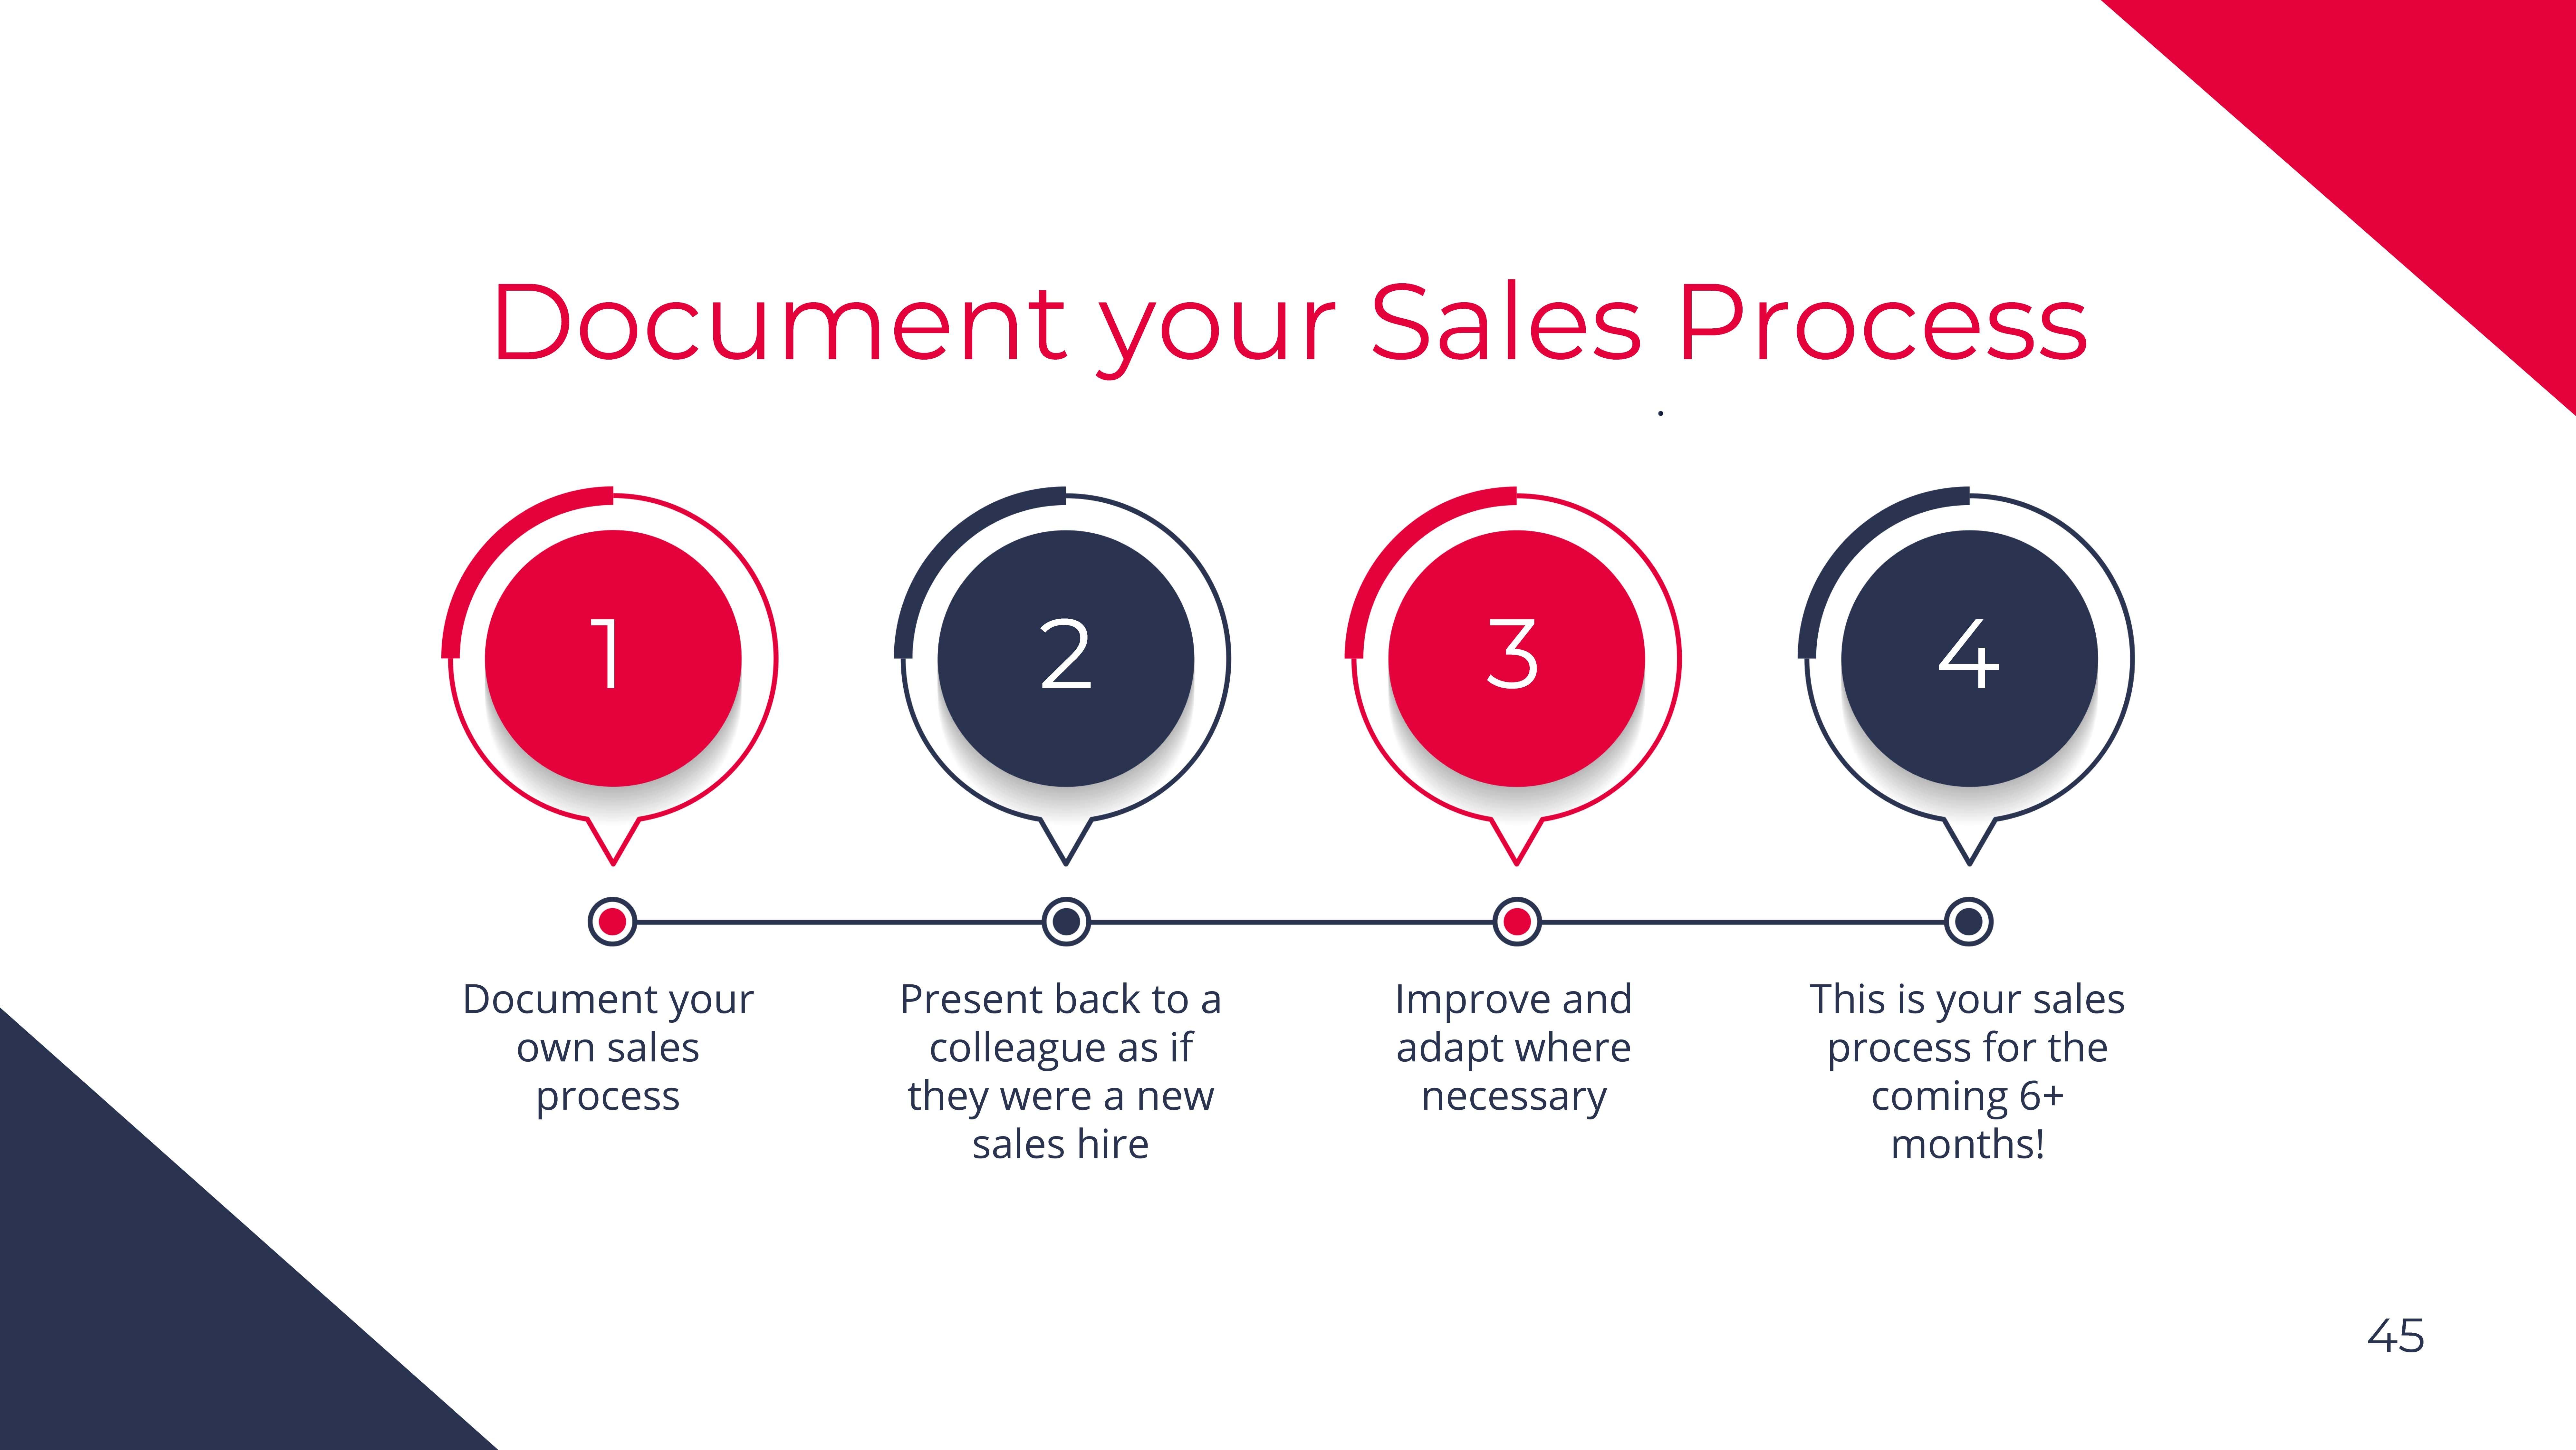 document your sales process